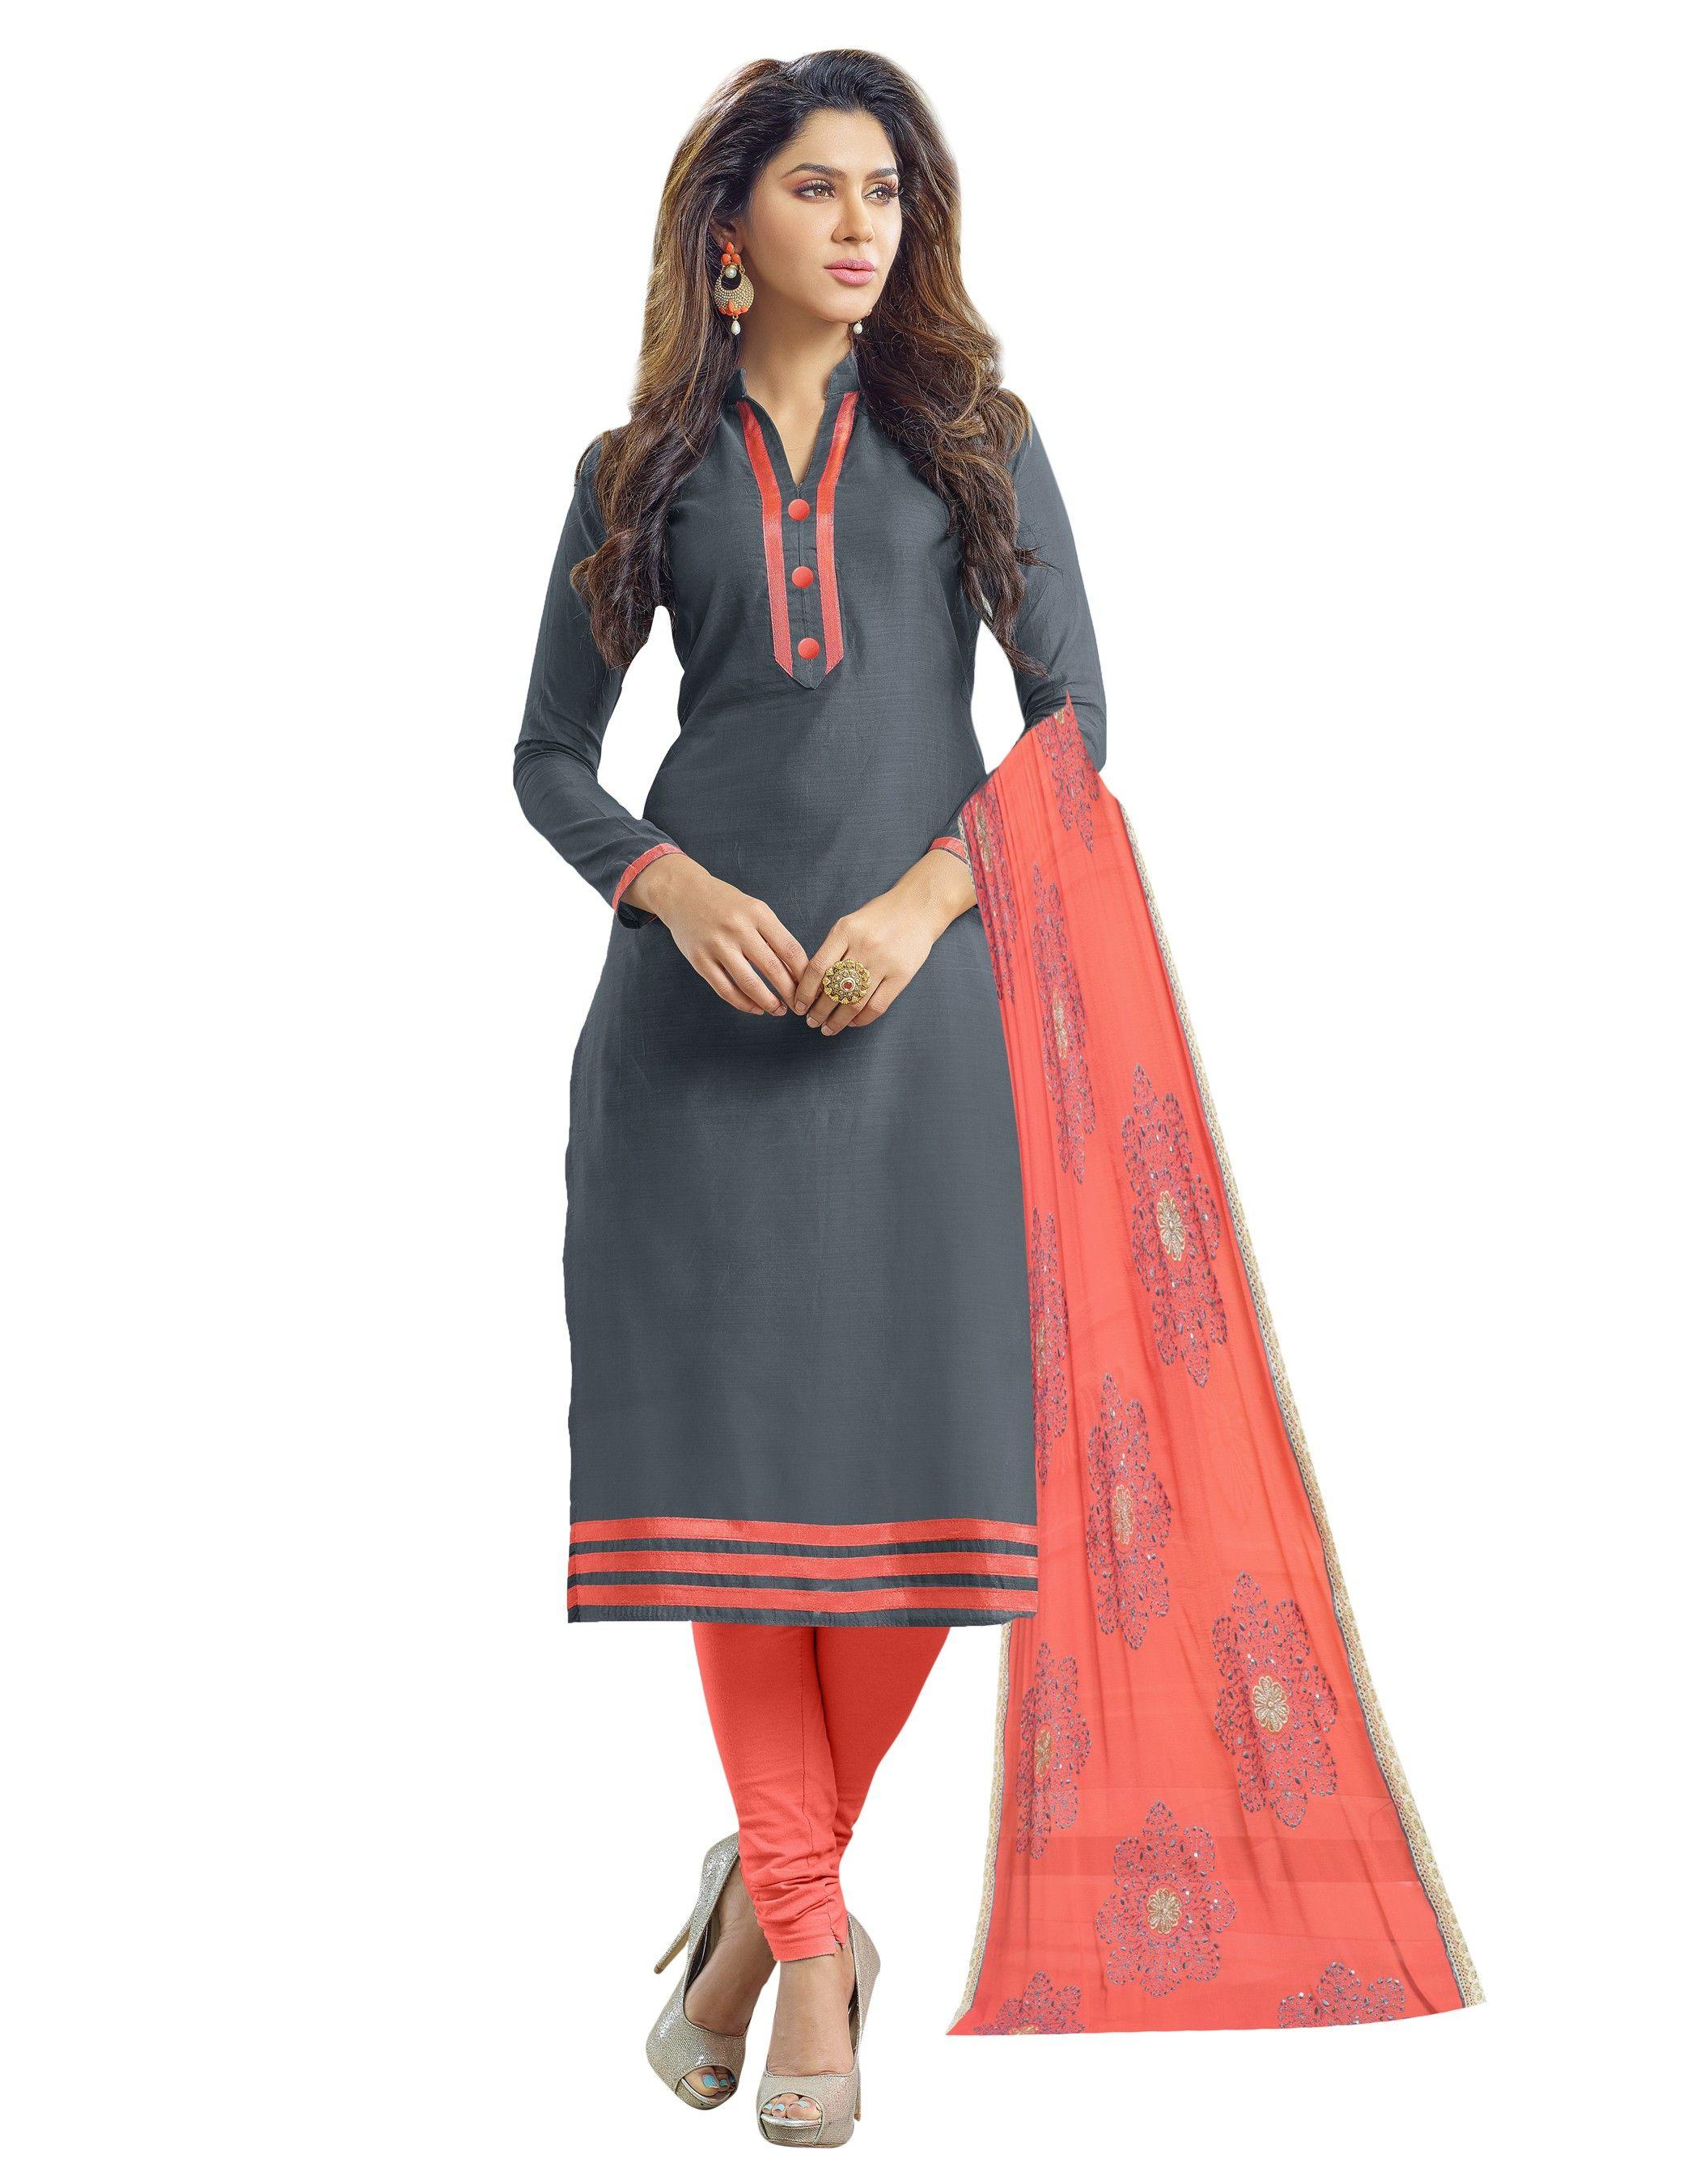 Unstitched Dress Material Rose Pink & Grey - Riti Riwaz